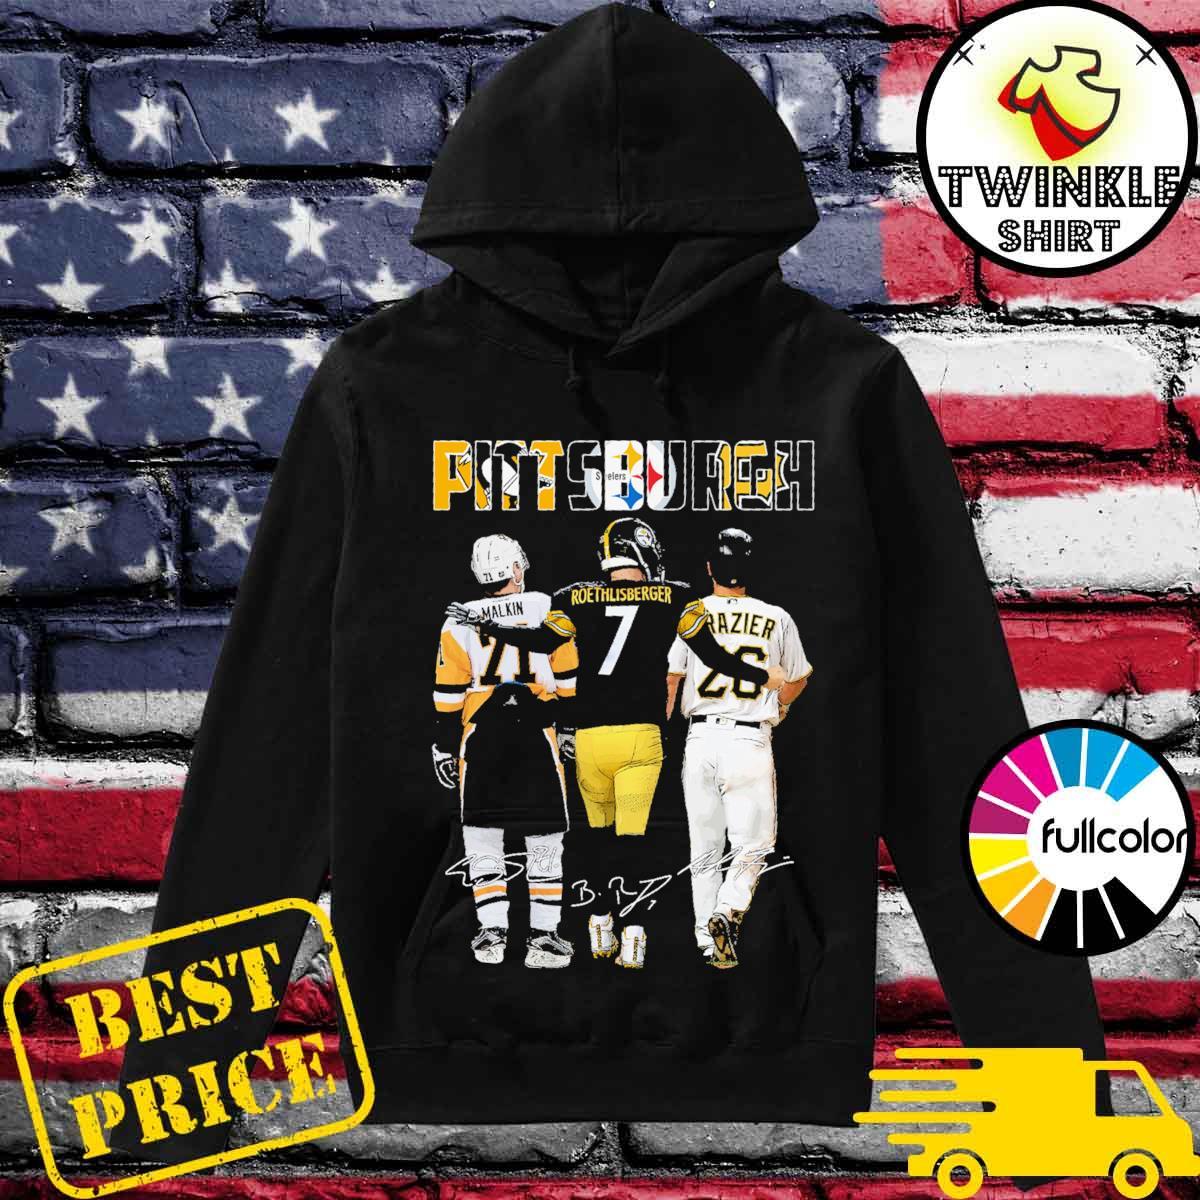 Pittsburgh Steelers Malkin Roethlisberger Raizer signatures s Hoodie